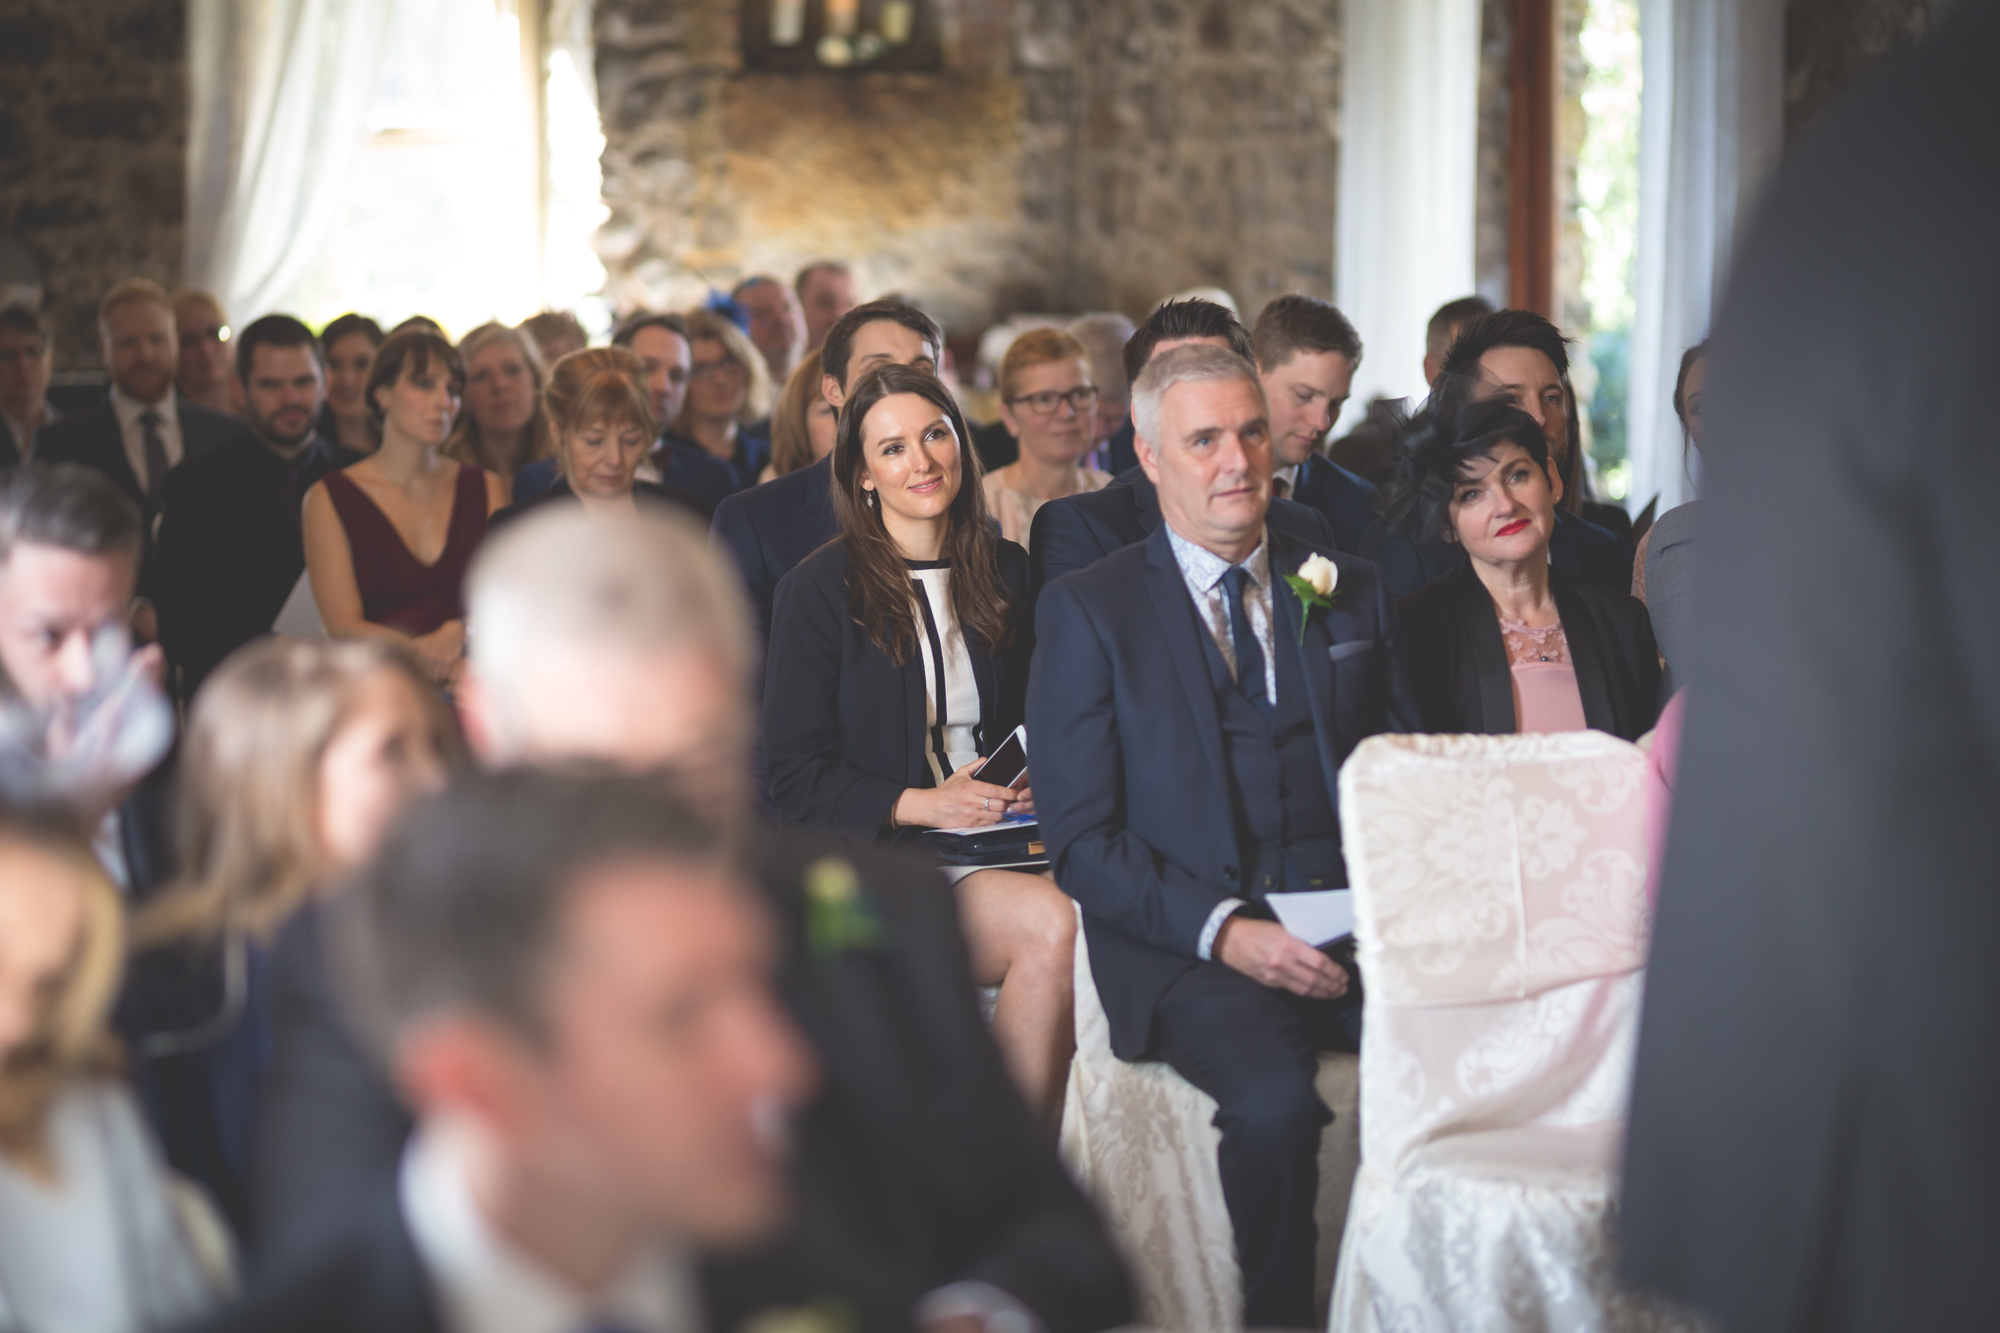 Steve_Emma_Ceremony-116.jpg